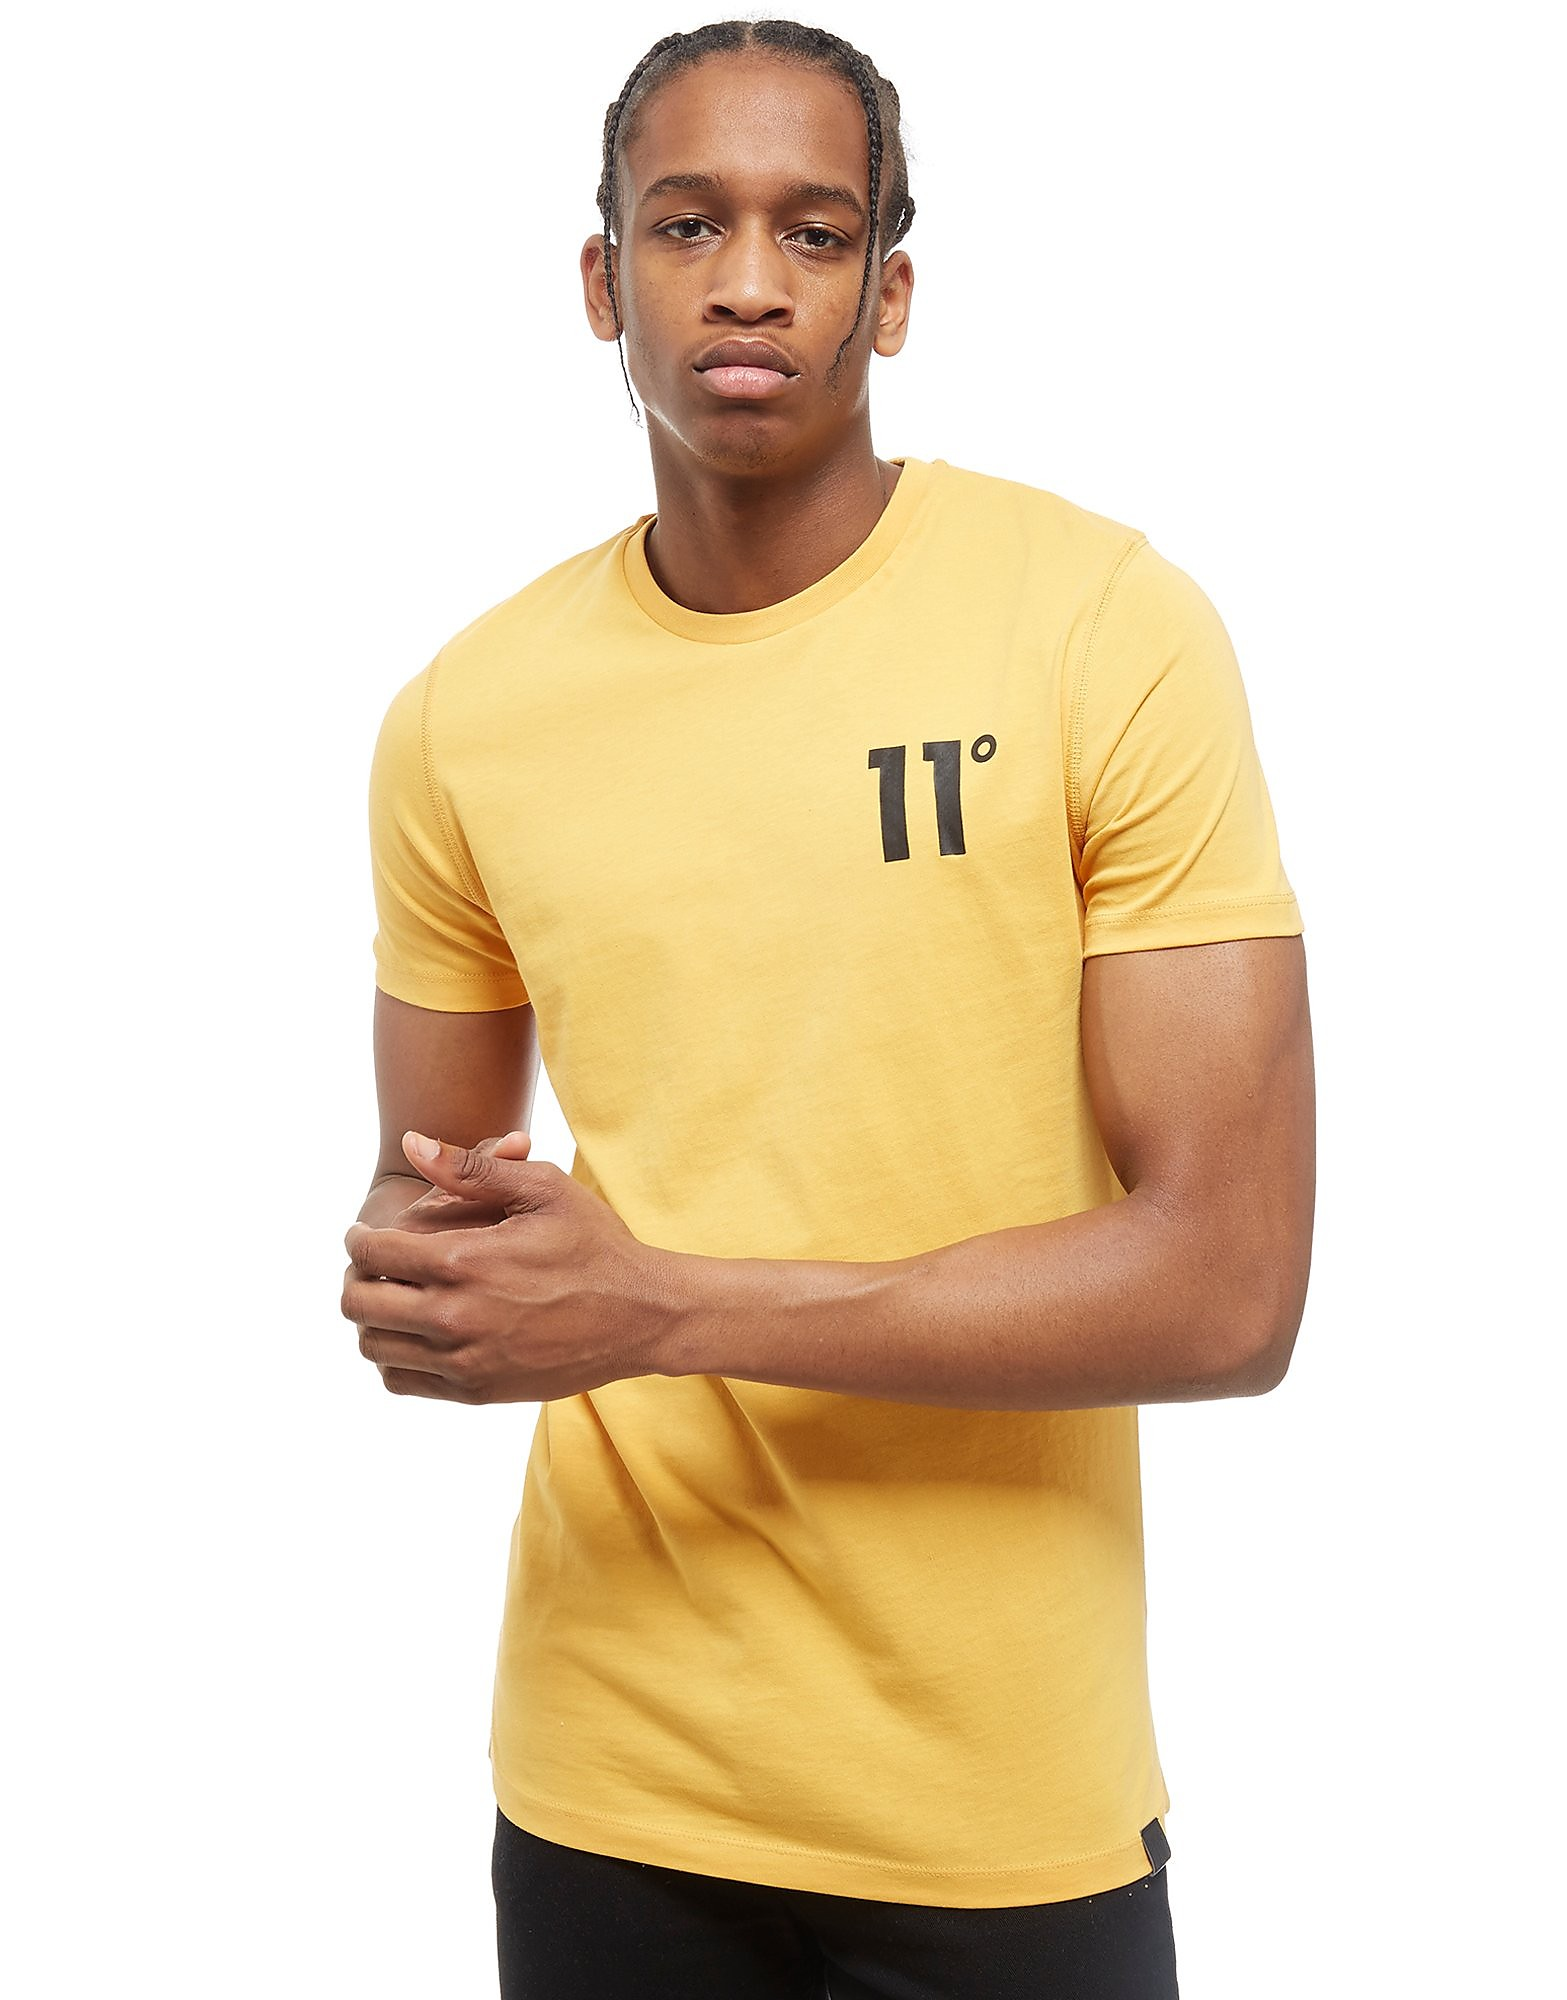 11 Degrees Core T-Shirt Homme - jaune, jaune